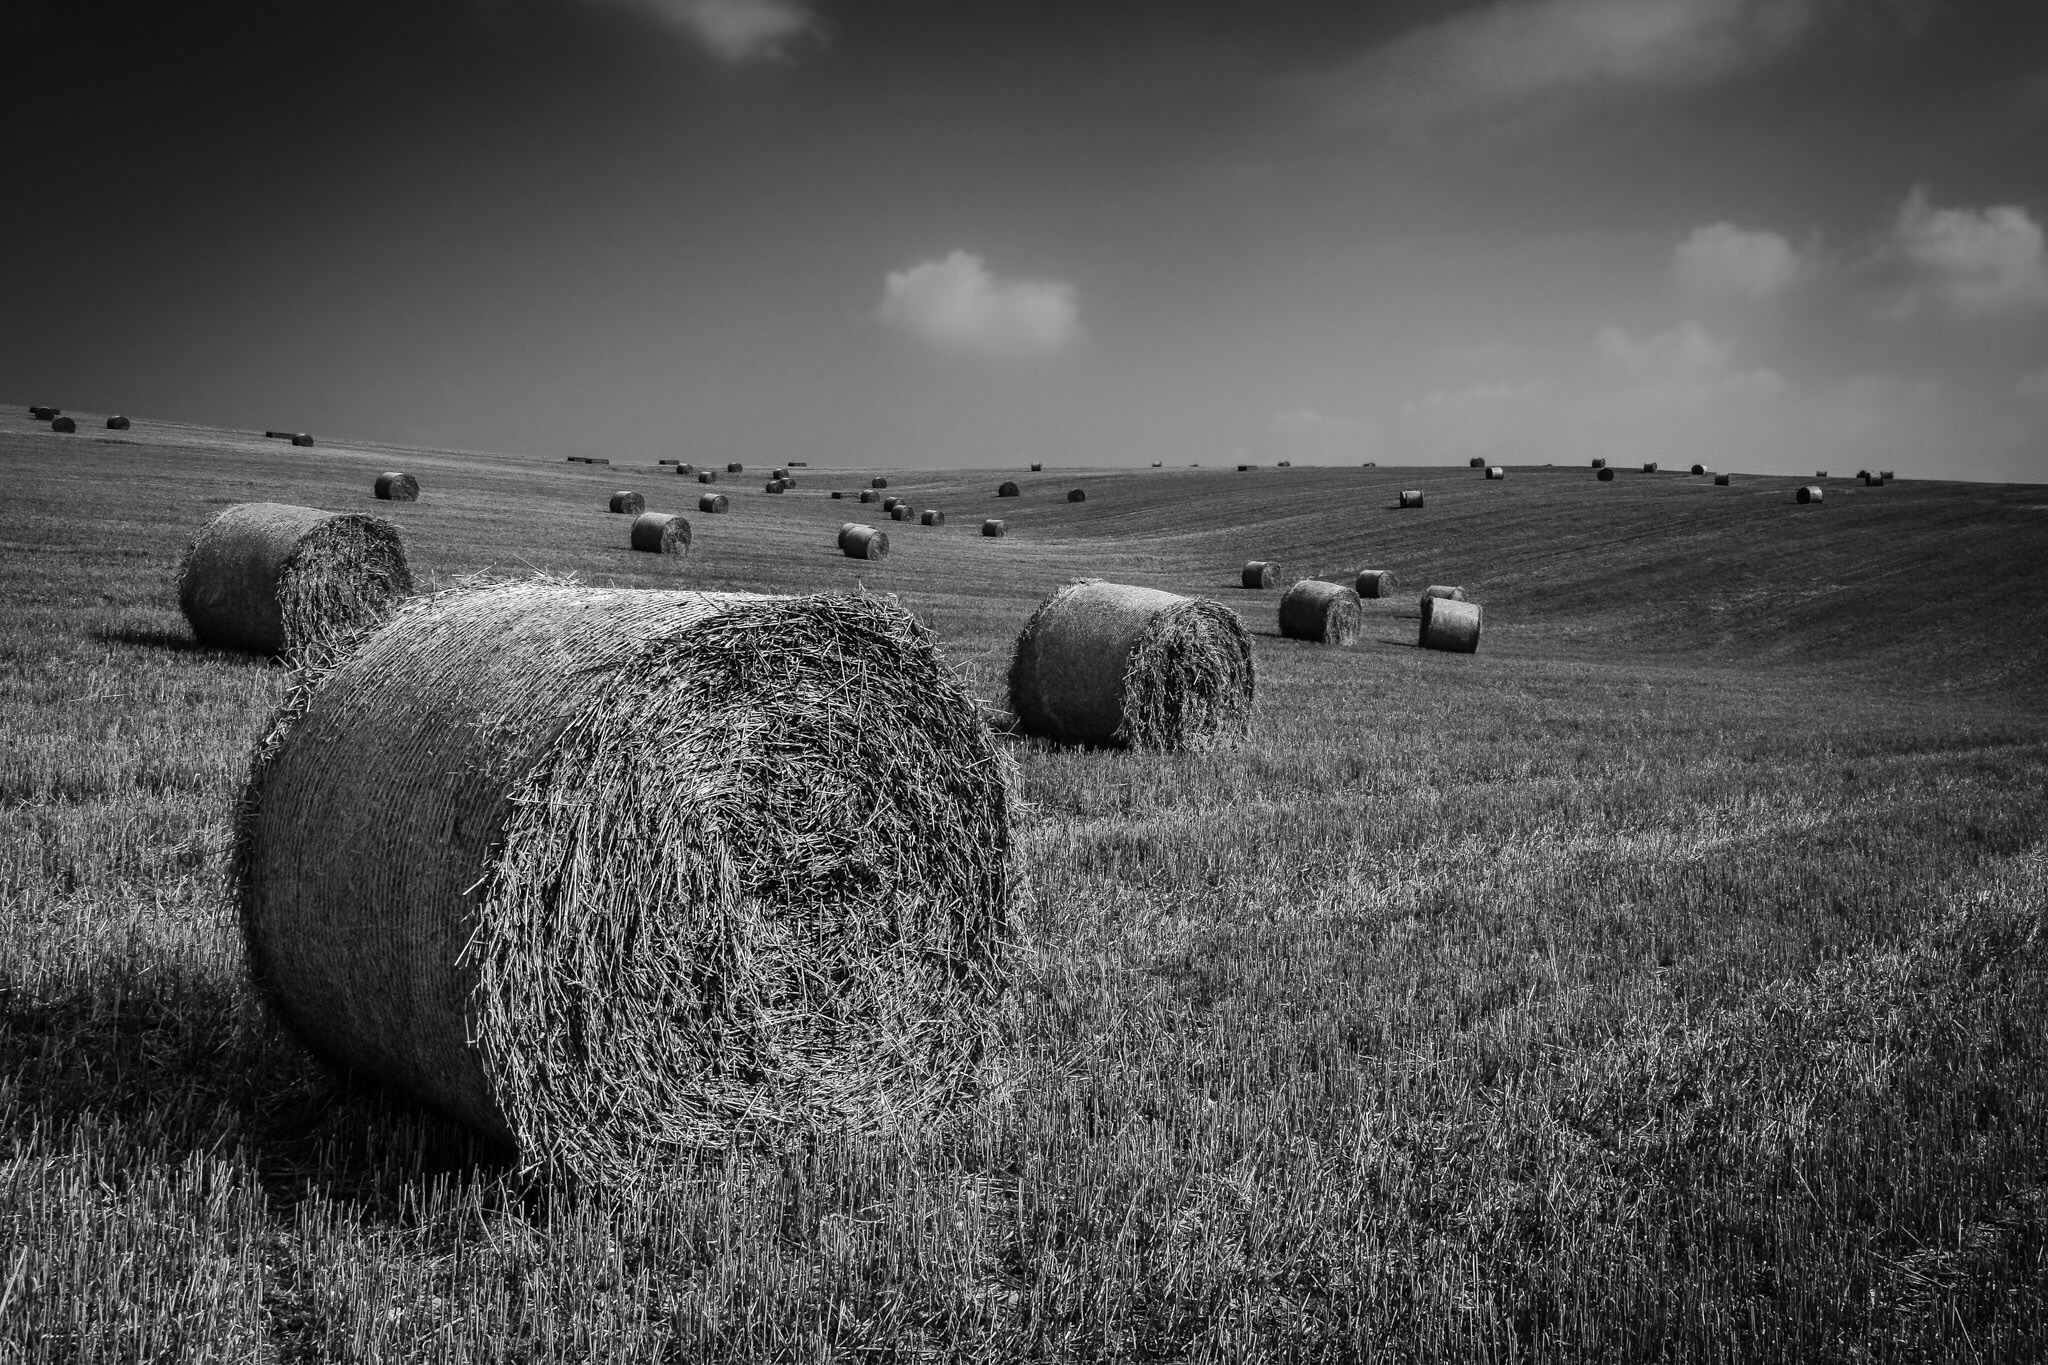 Hay bale, Dorset